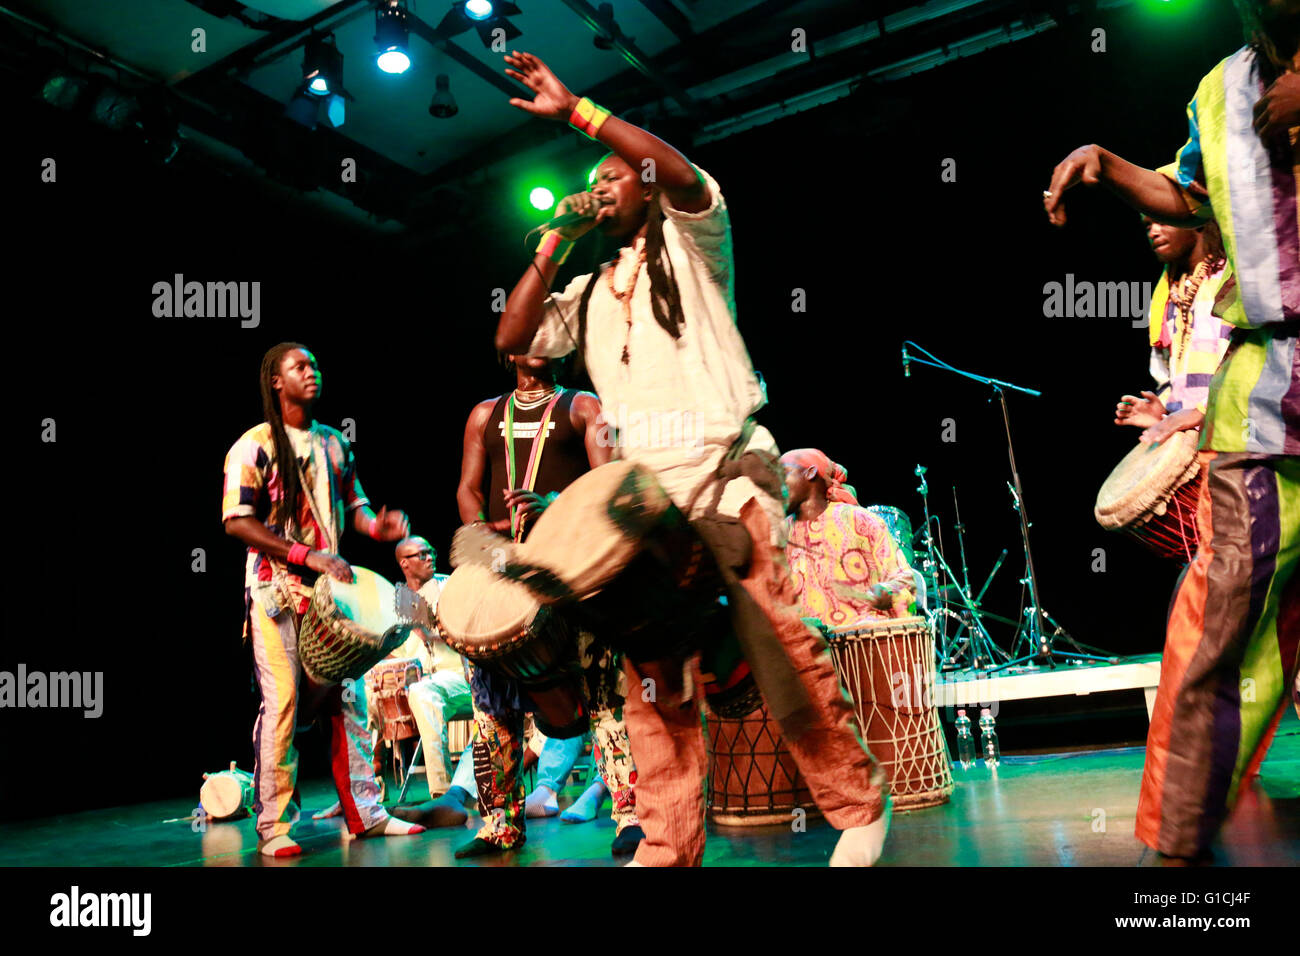 Nago Koite und SAF SAP (Senegal) - Global Drums Festival, Werkstatt der Kulturen, 17. Januar 2015, Berlino-Kreuzberg. Immagini Stock